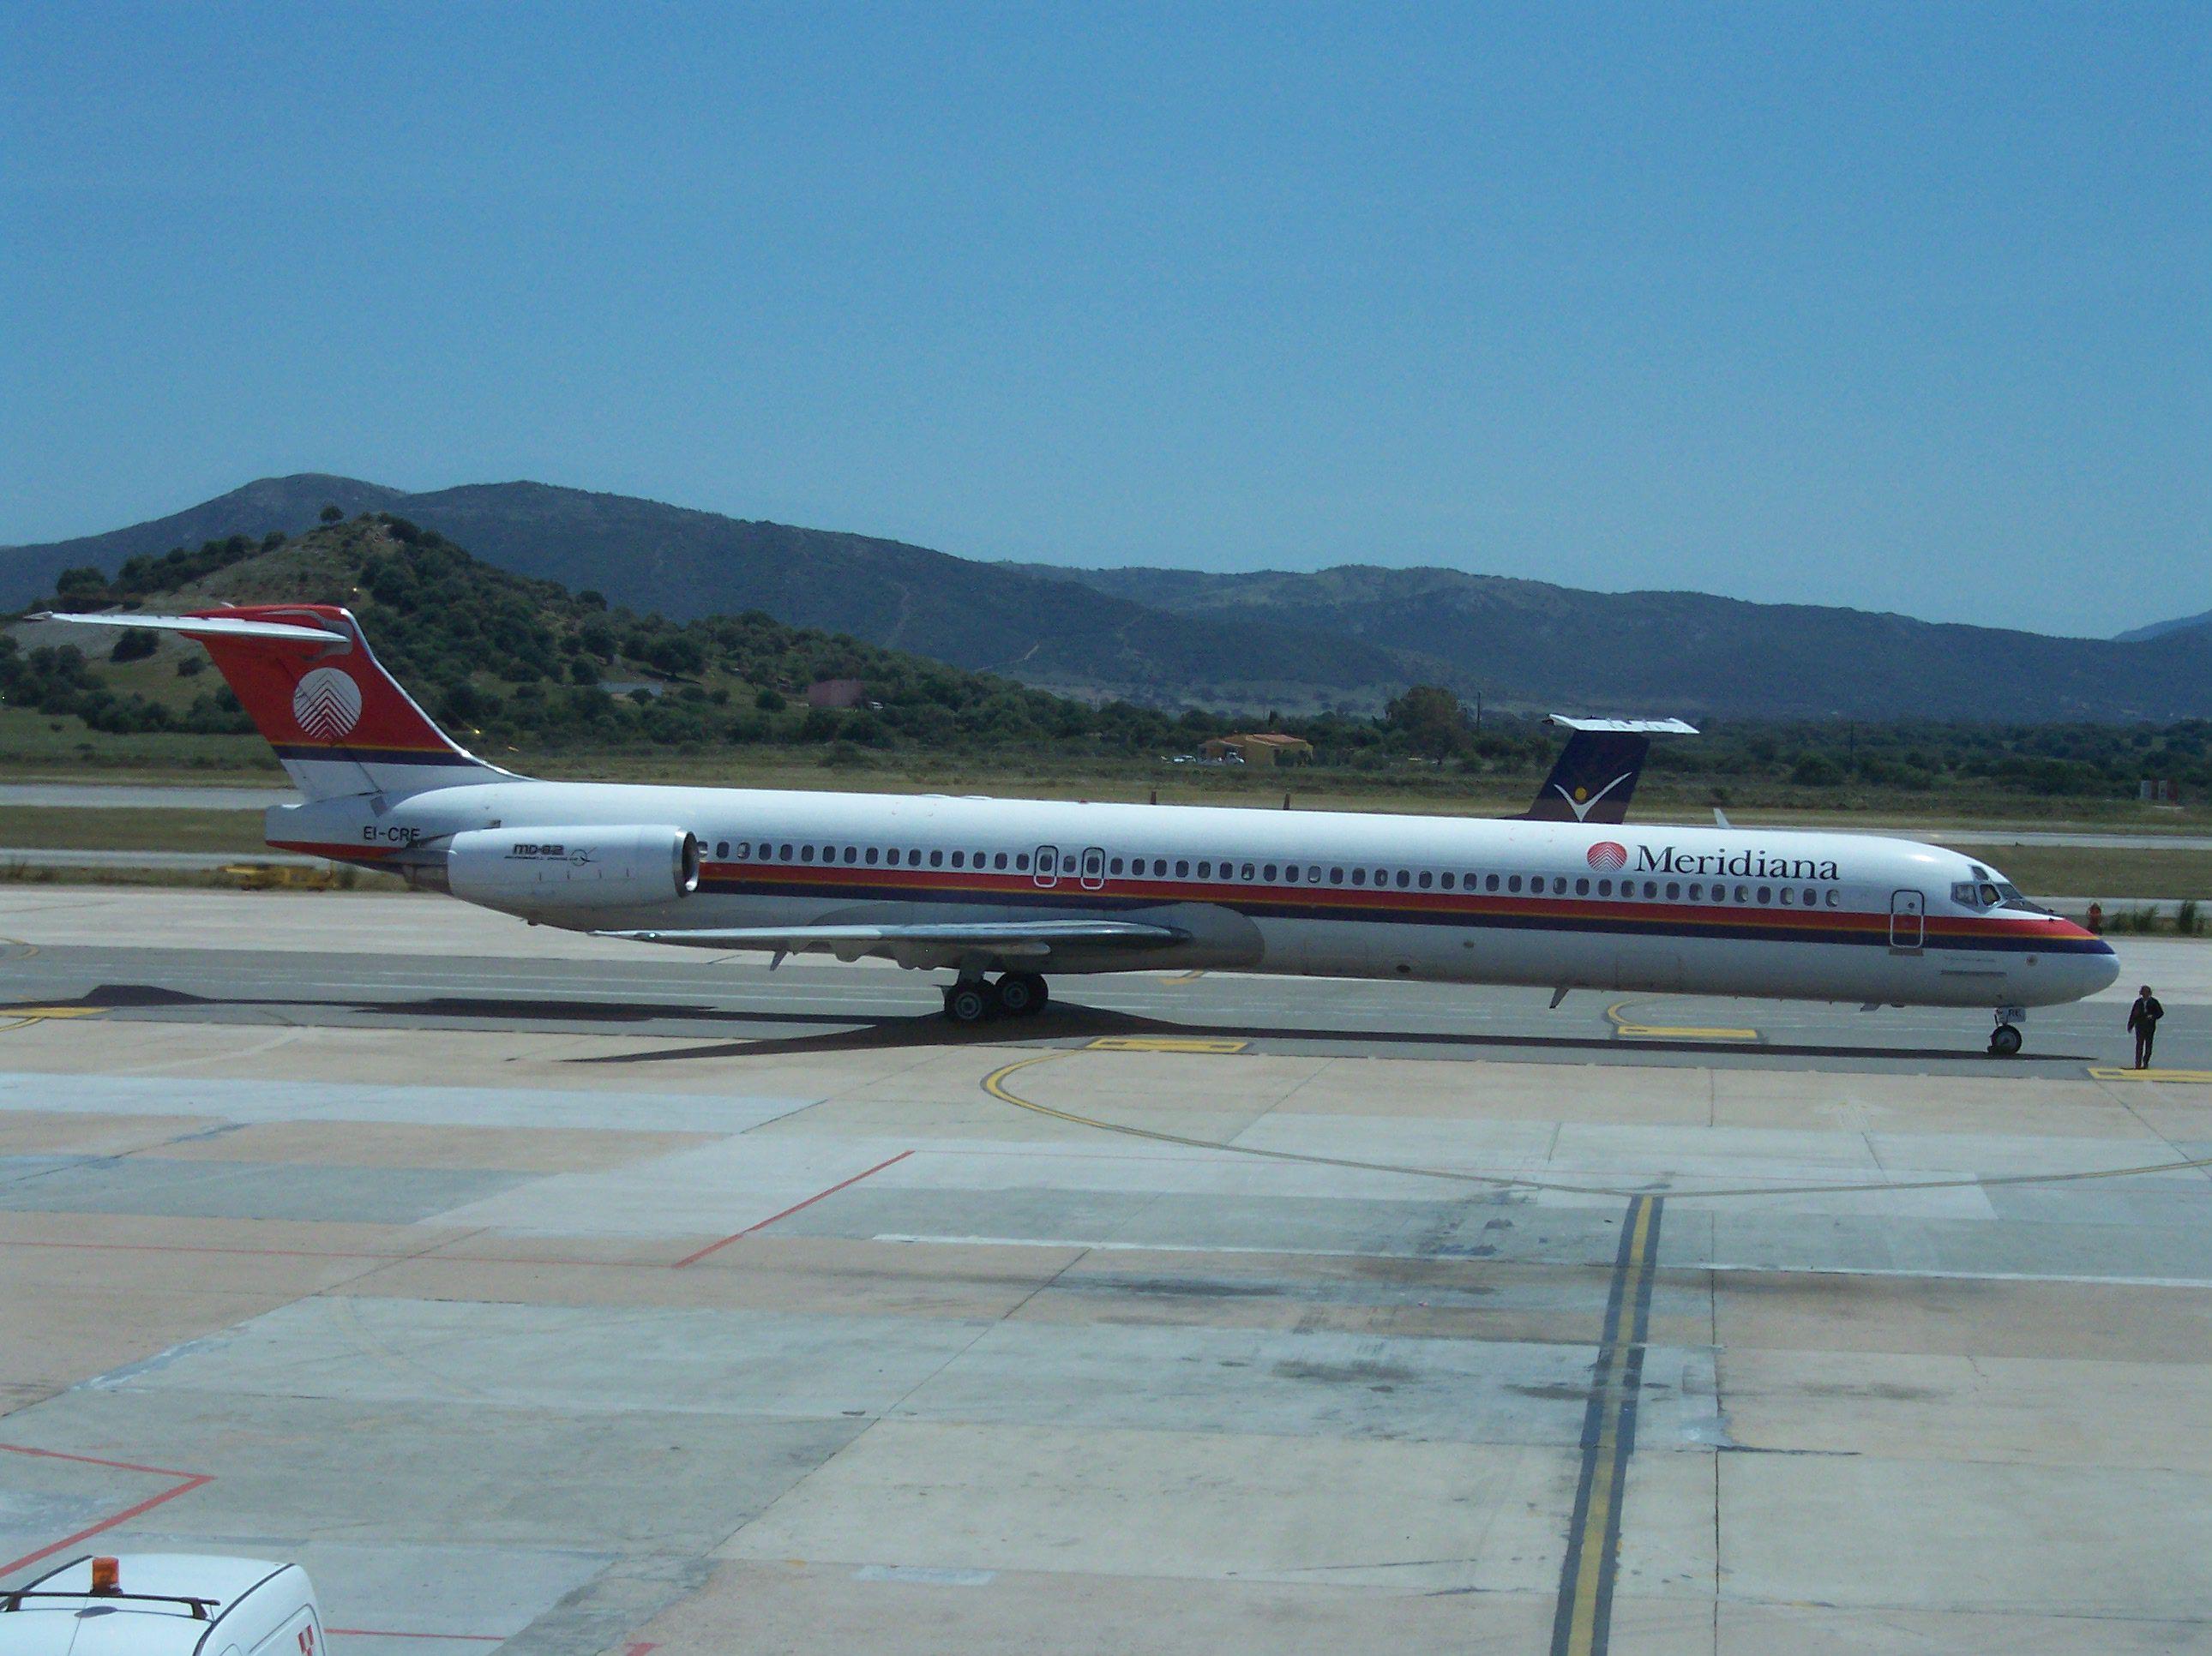 Datei:McDonnell Douglas MD-82 Meridiana ...